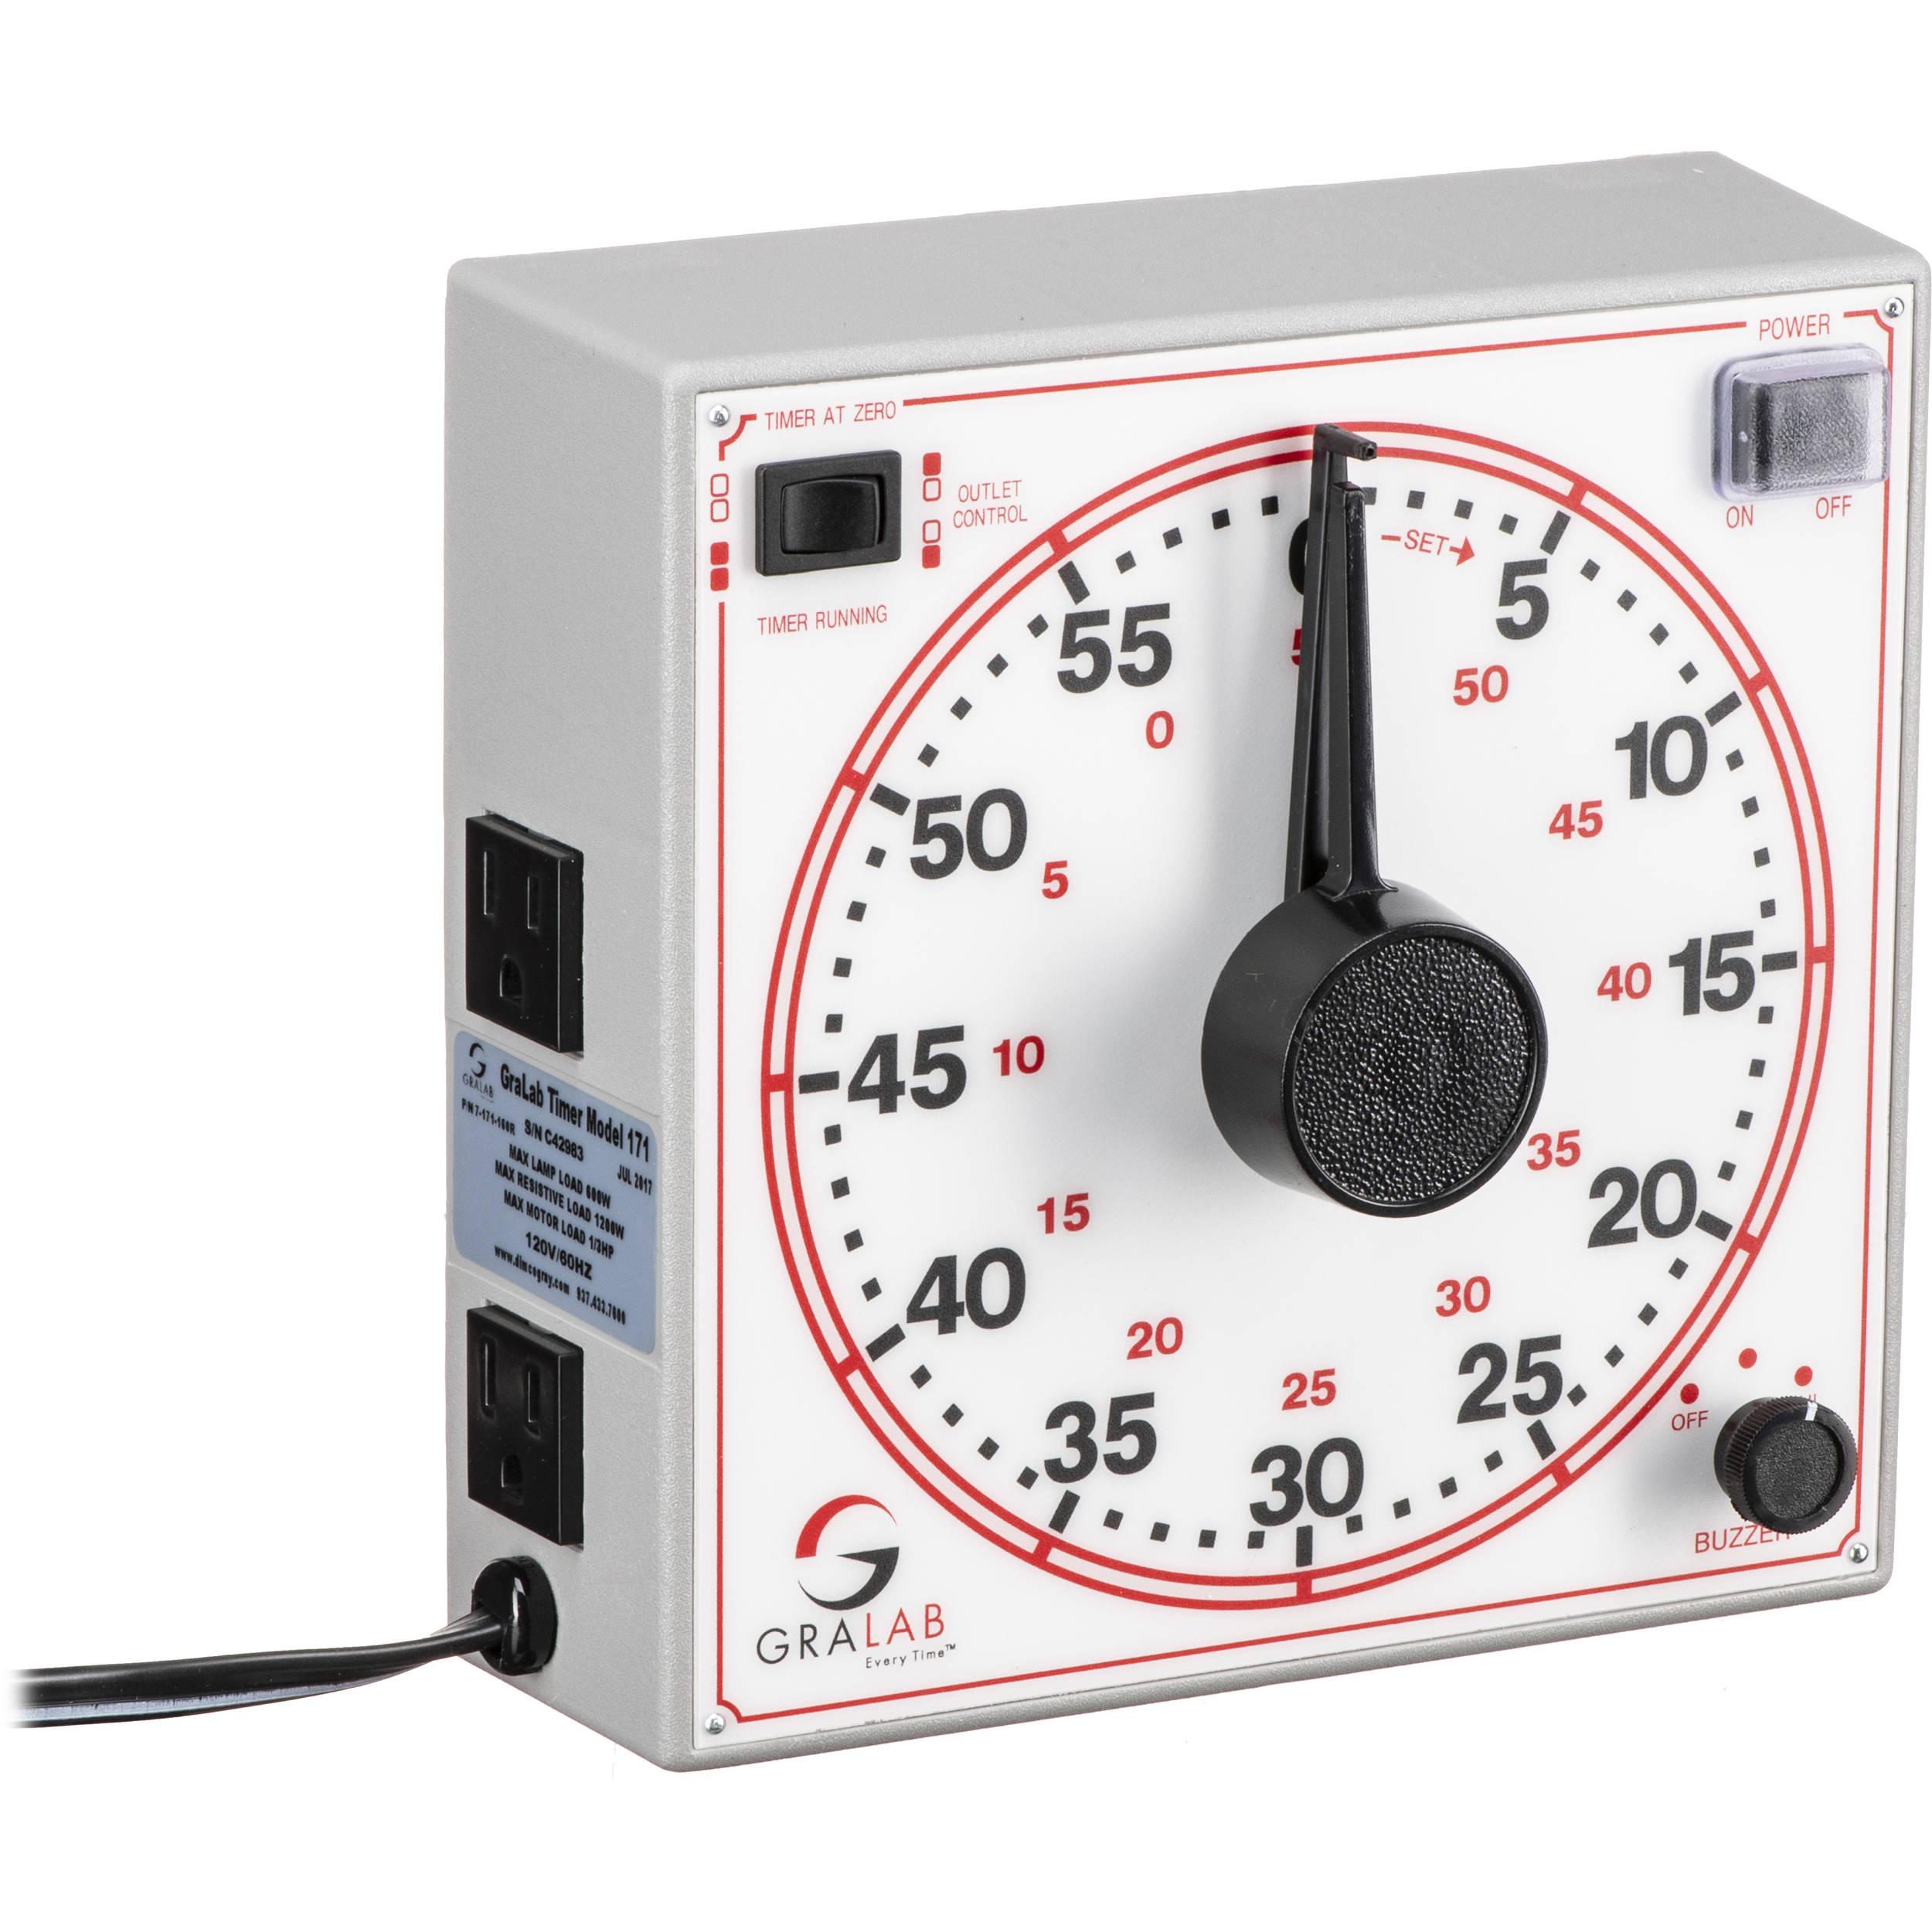 ham radio 10 minute timer - Monza berglauf-verband com